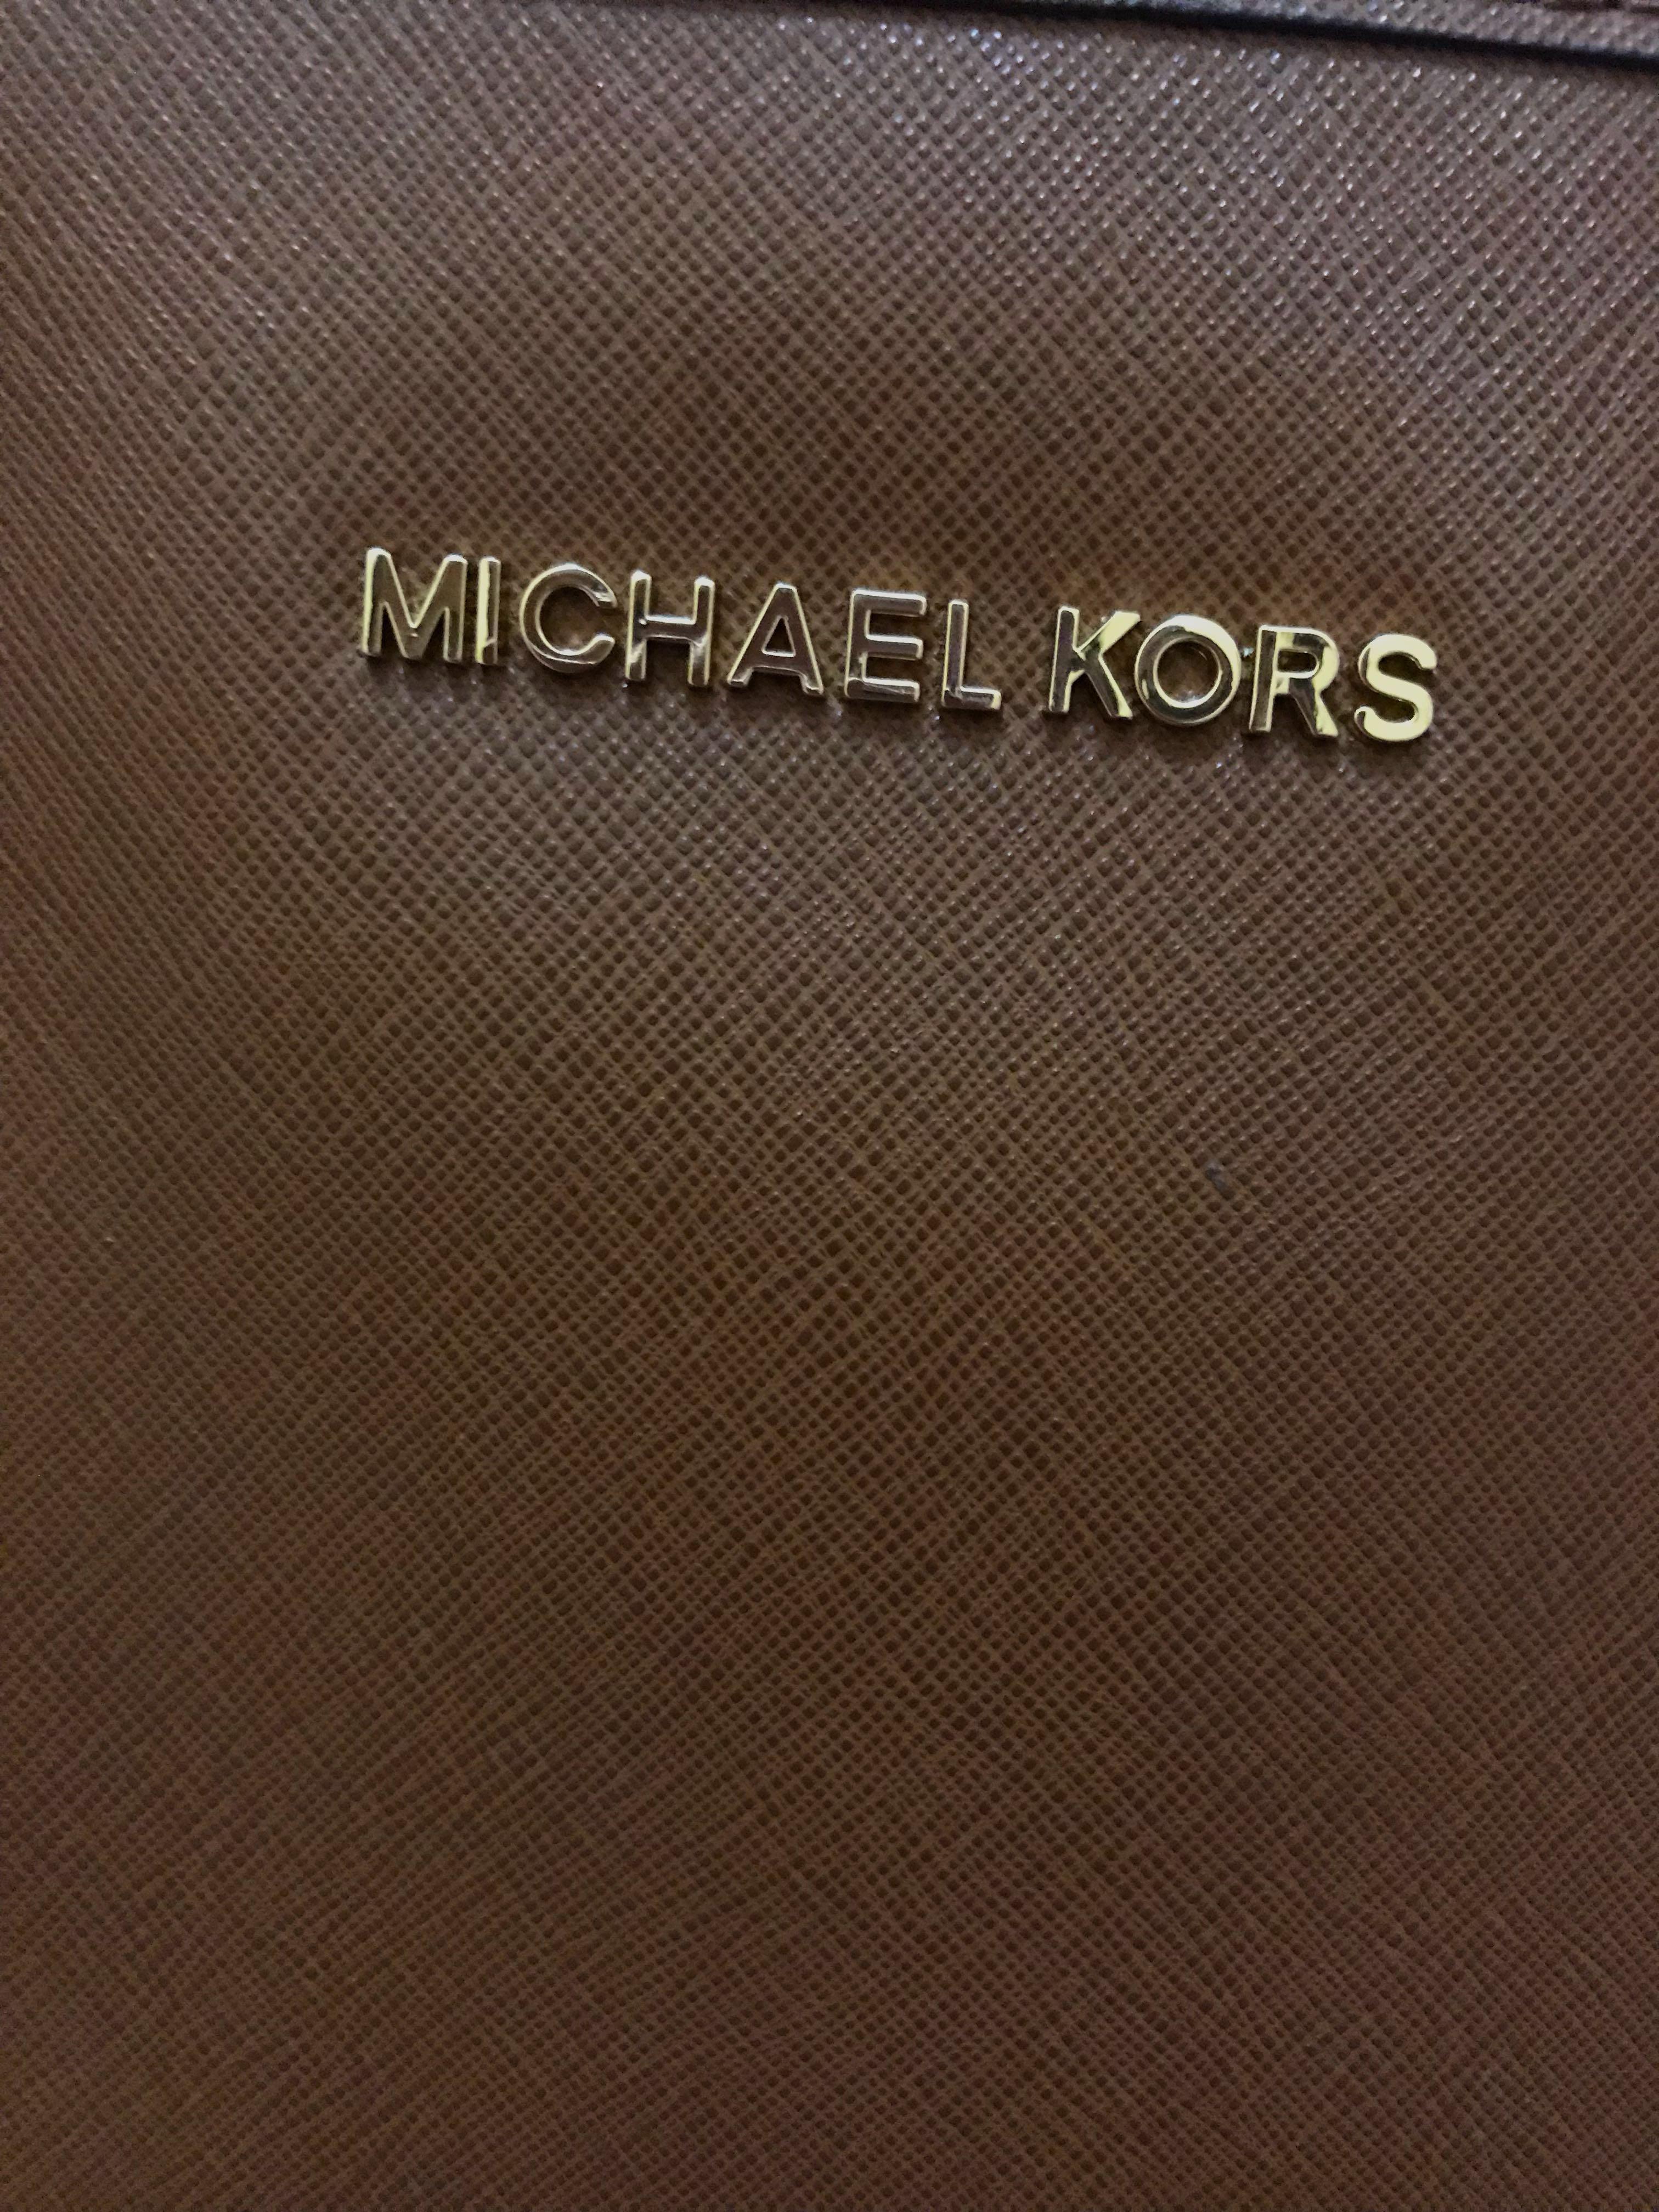 SALE FAST NETT Michael kors authentic (used 2 week) ❌ nego